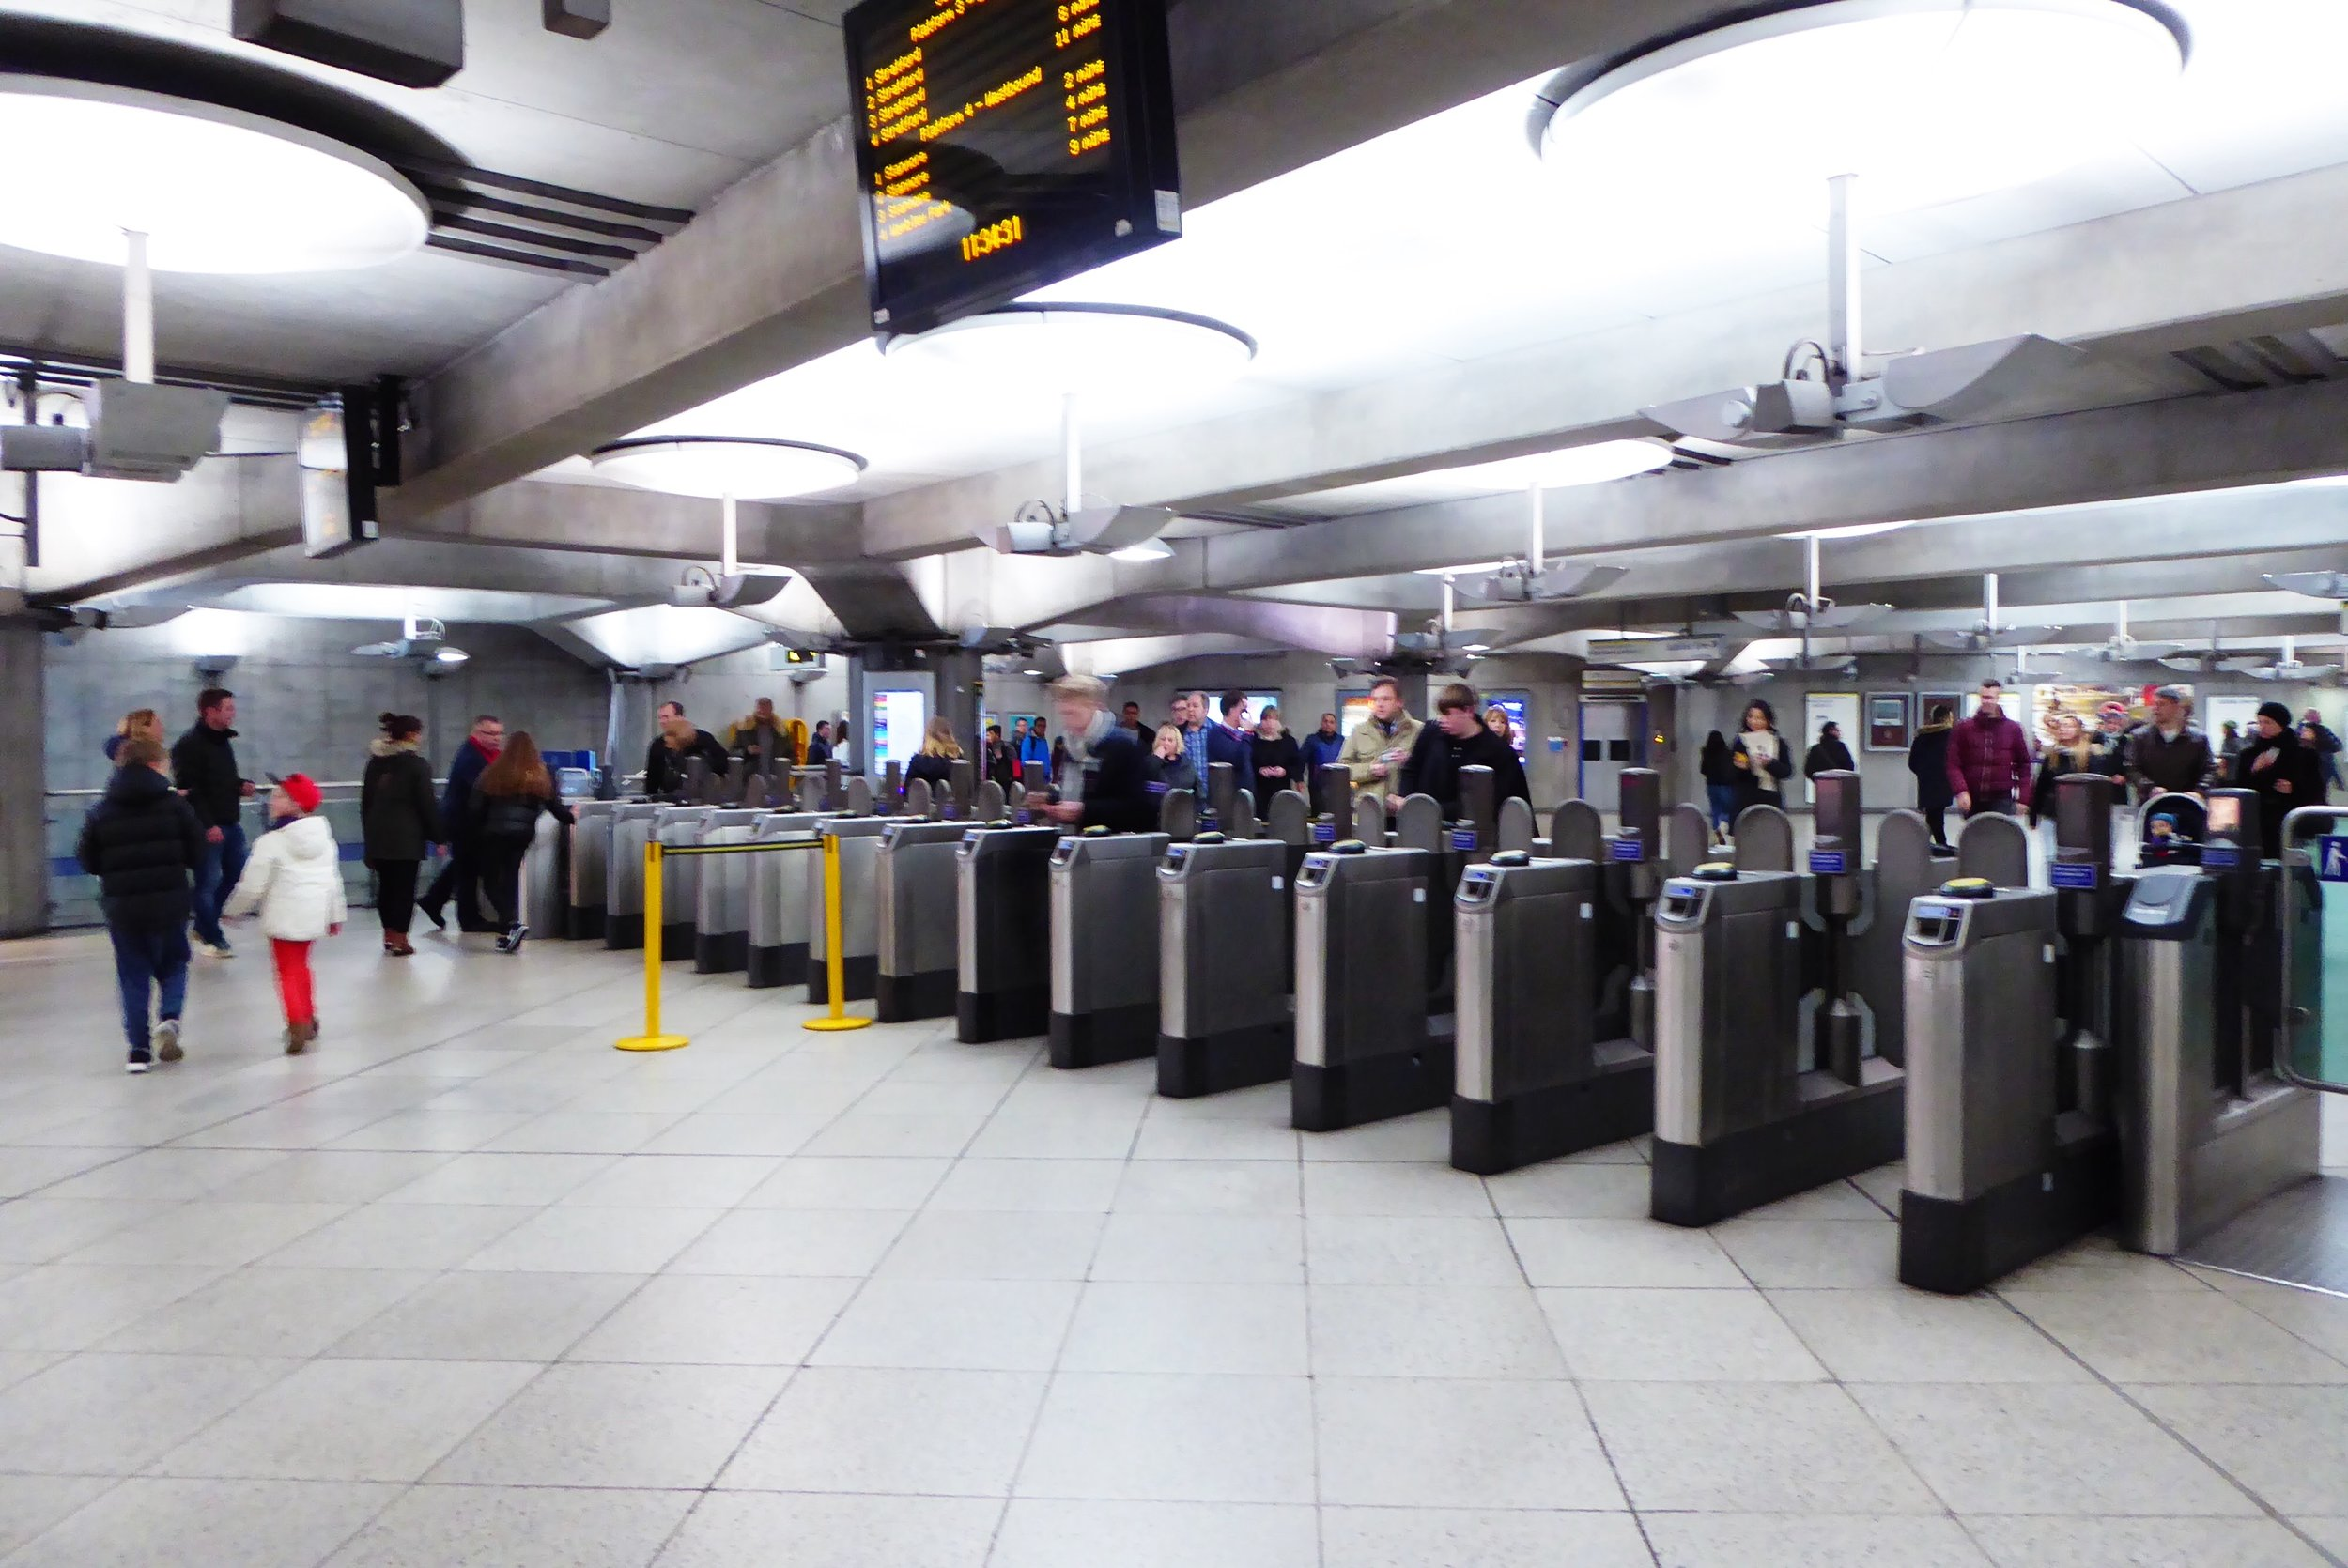 Estación de Metro Westminster